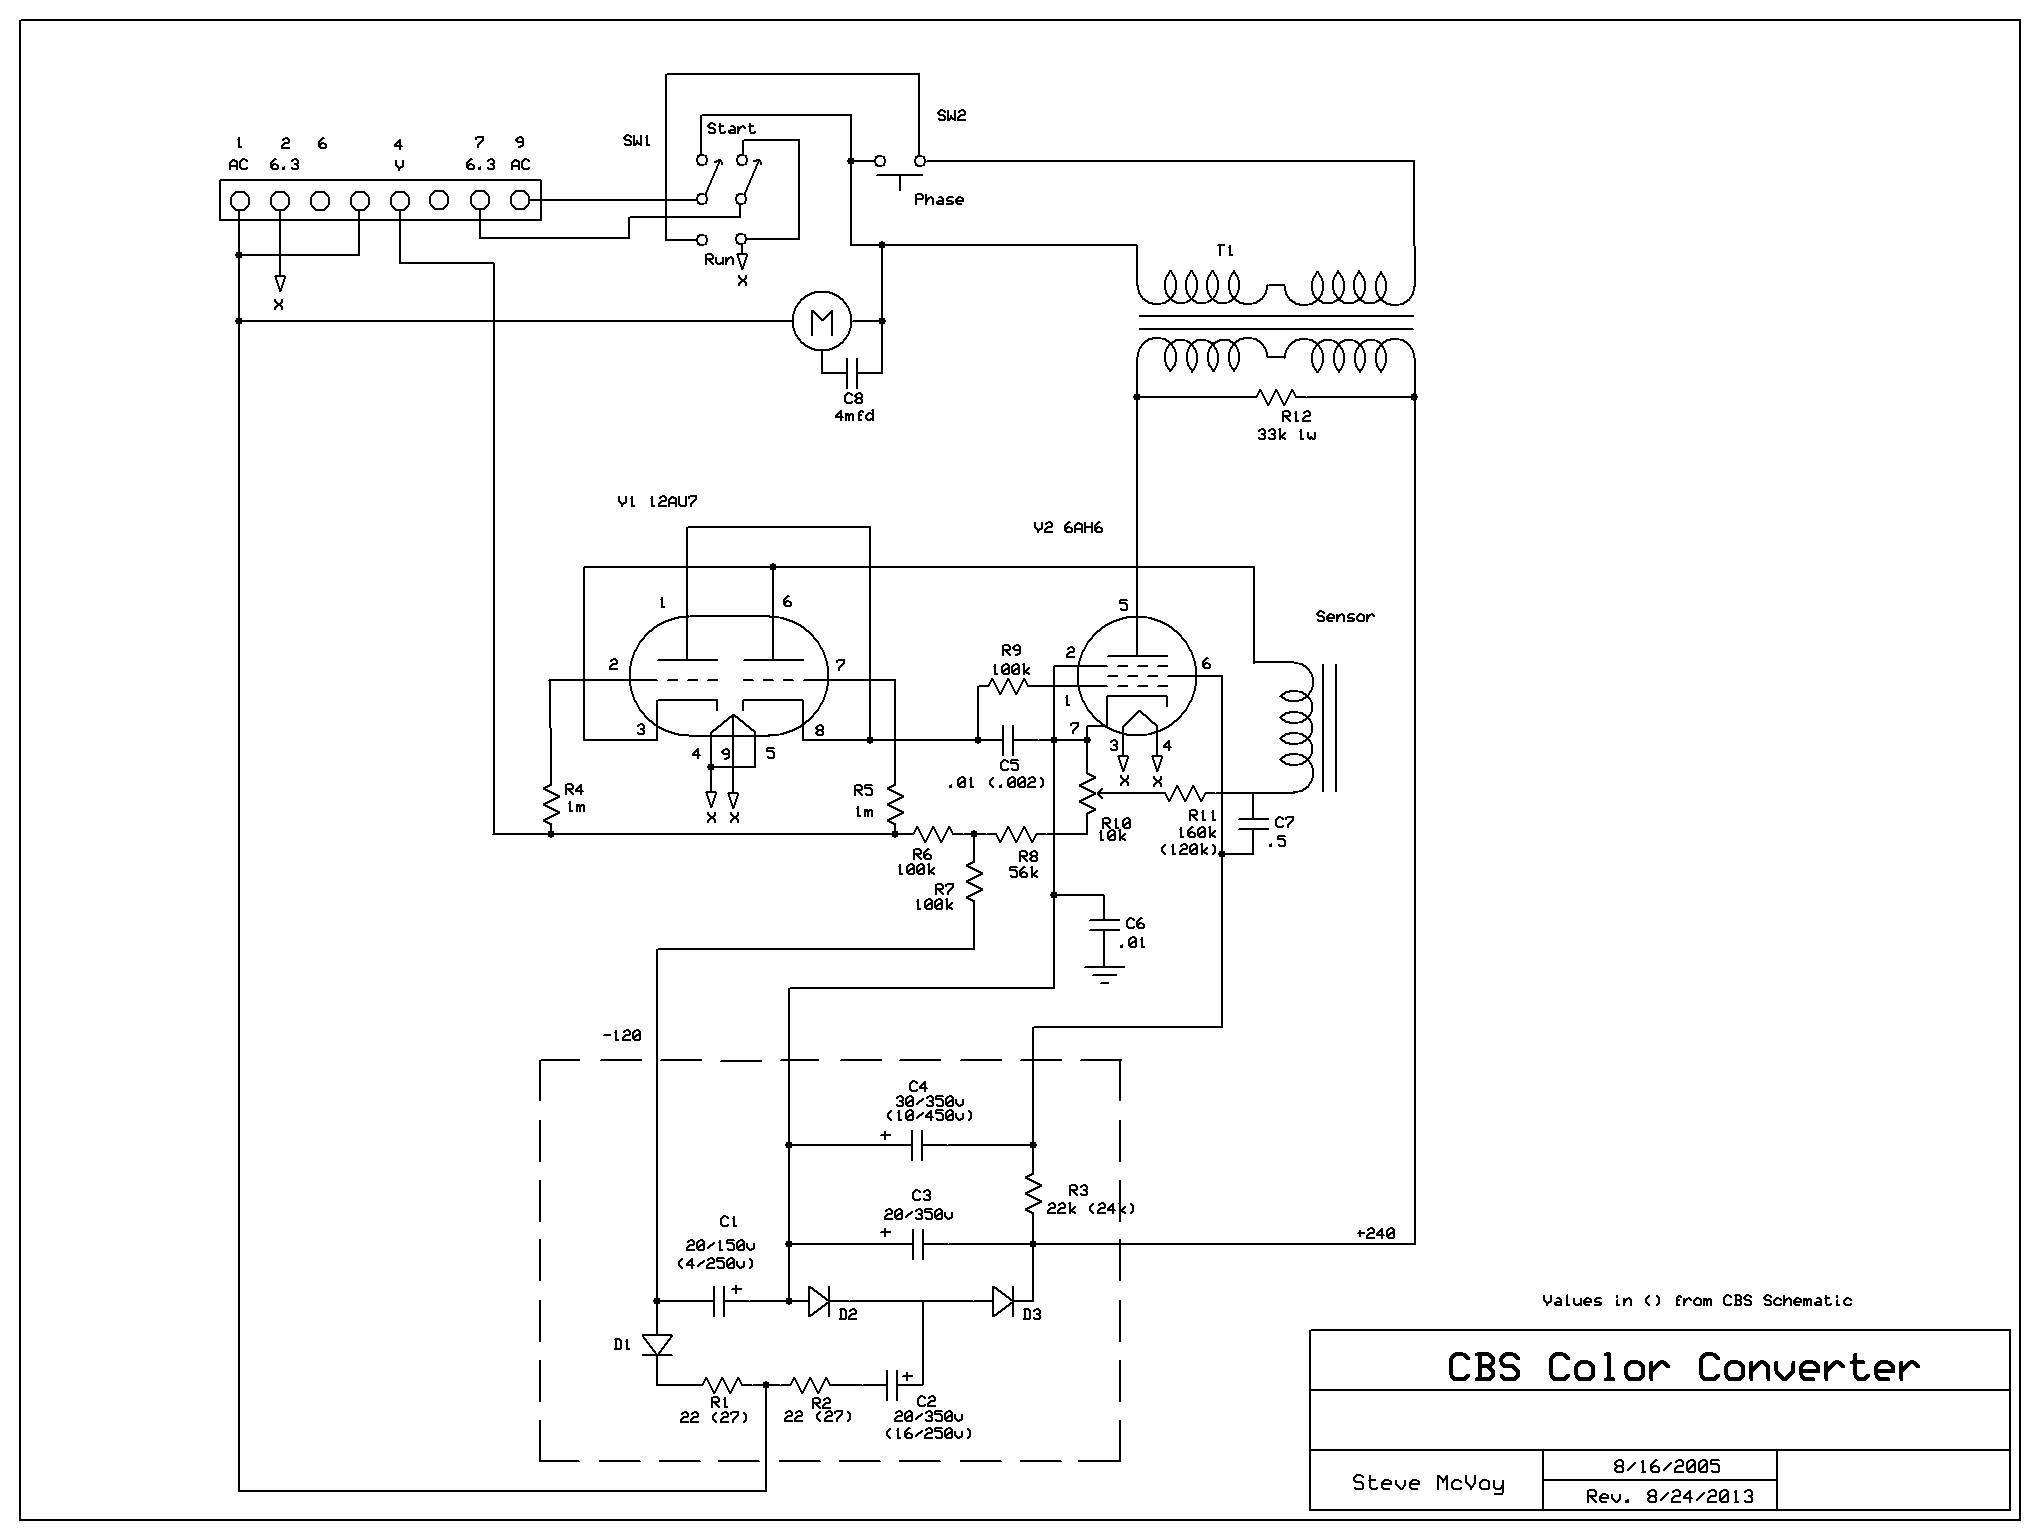 Tac 48 Refrigeration Wiring Diagram Third Level True Cooler Diagrams T 23 23f 49 Basic System